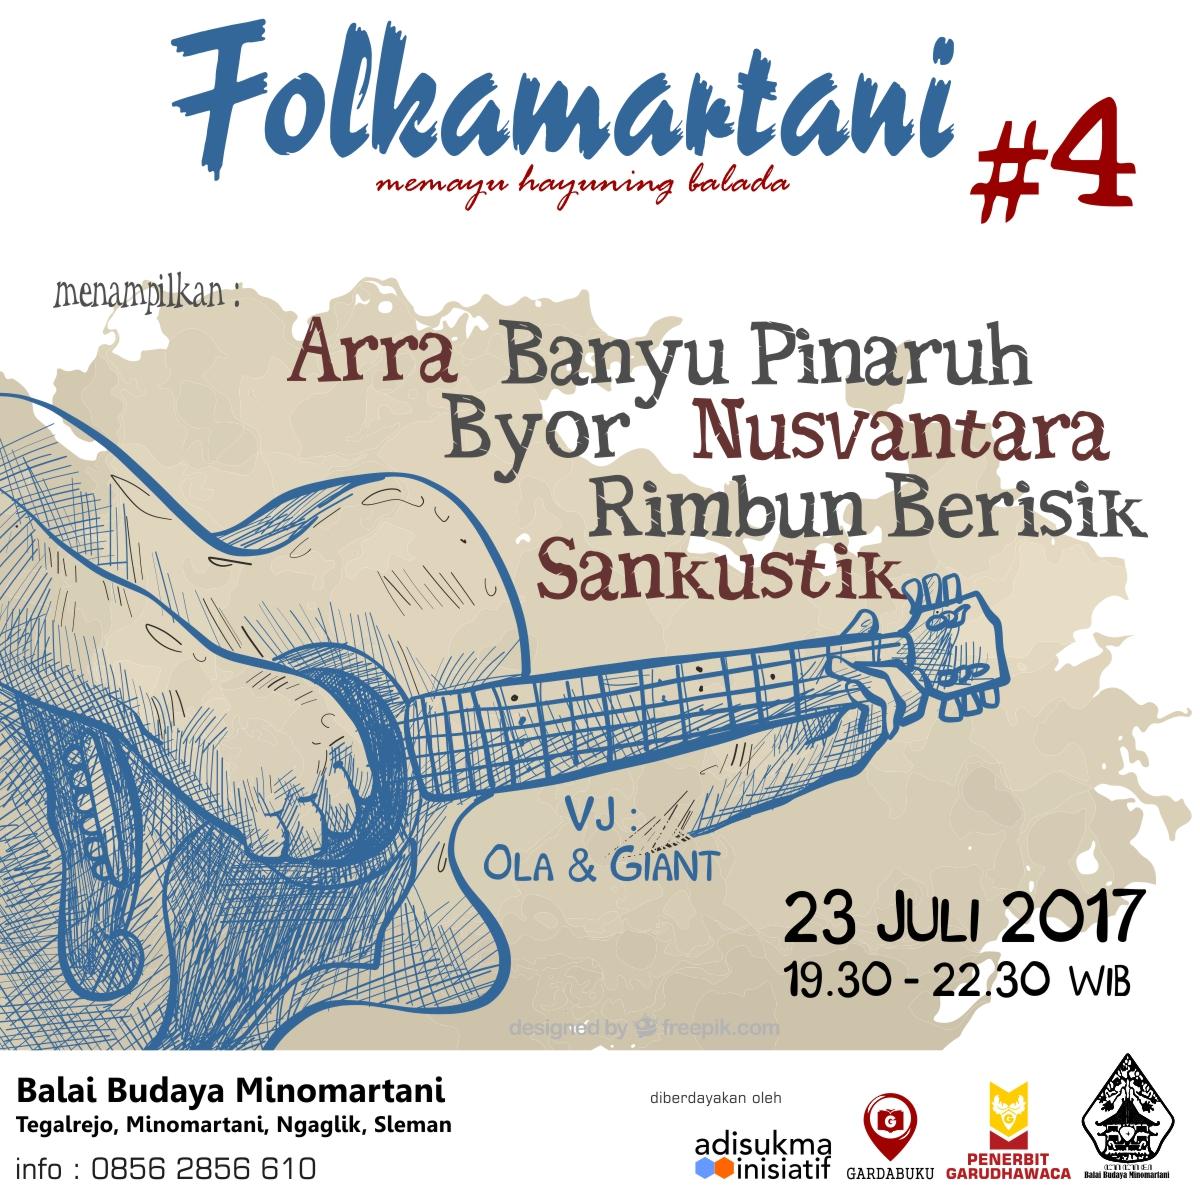 Poster Folkamartani 4b 1 | Musik | FOLKAMARTANI #4